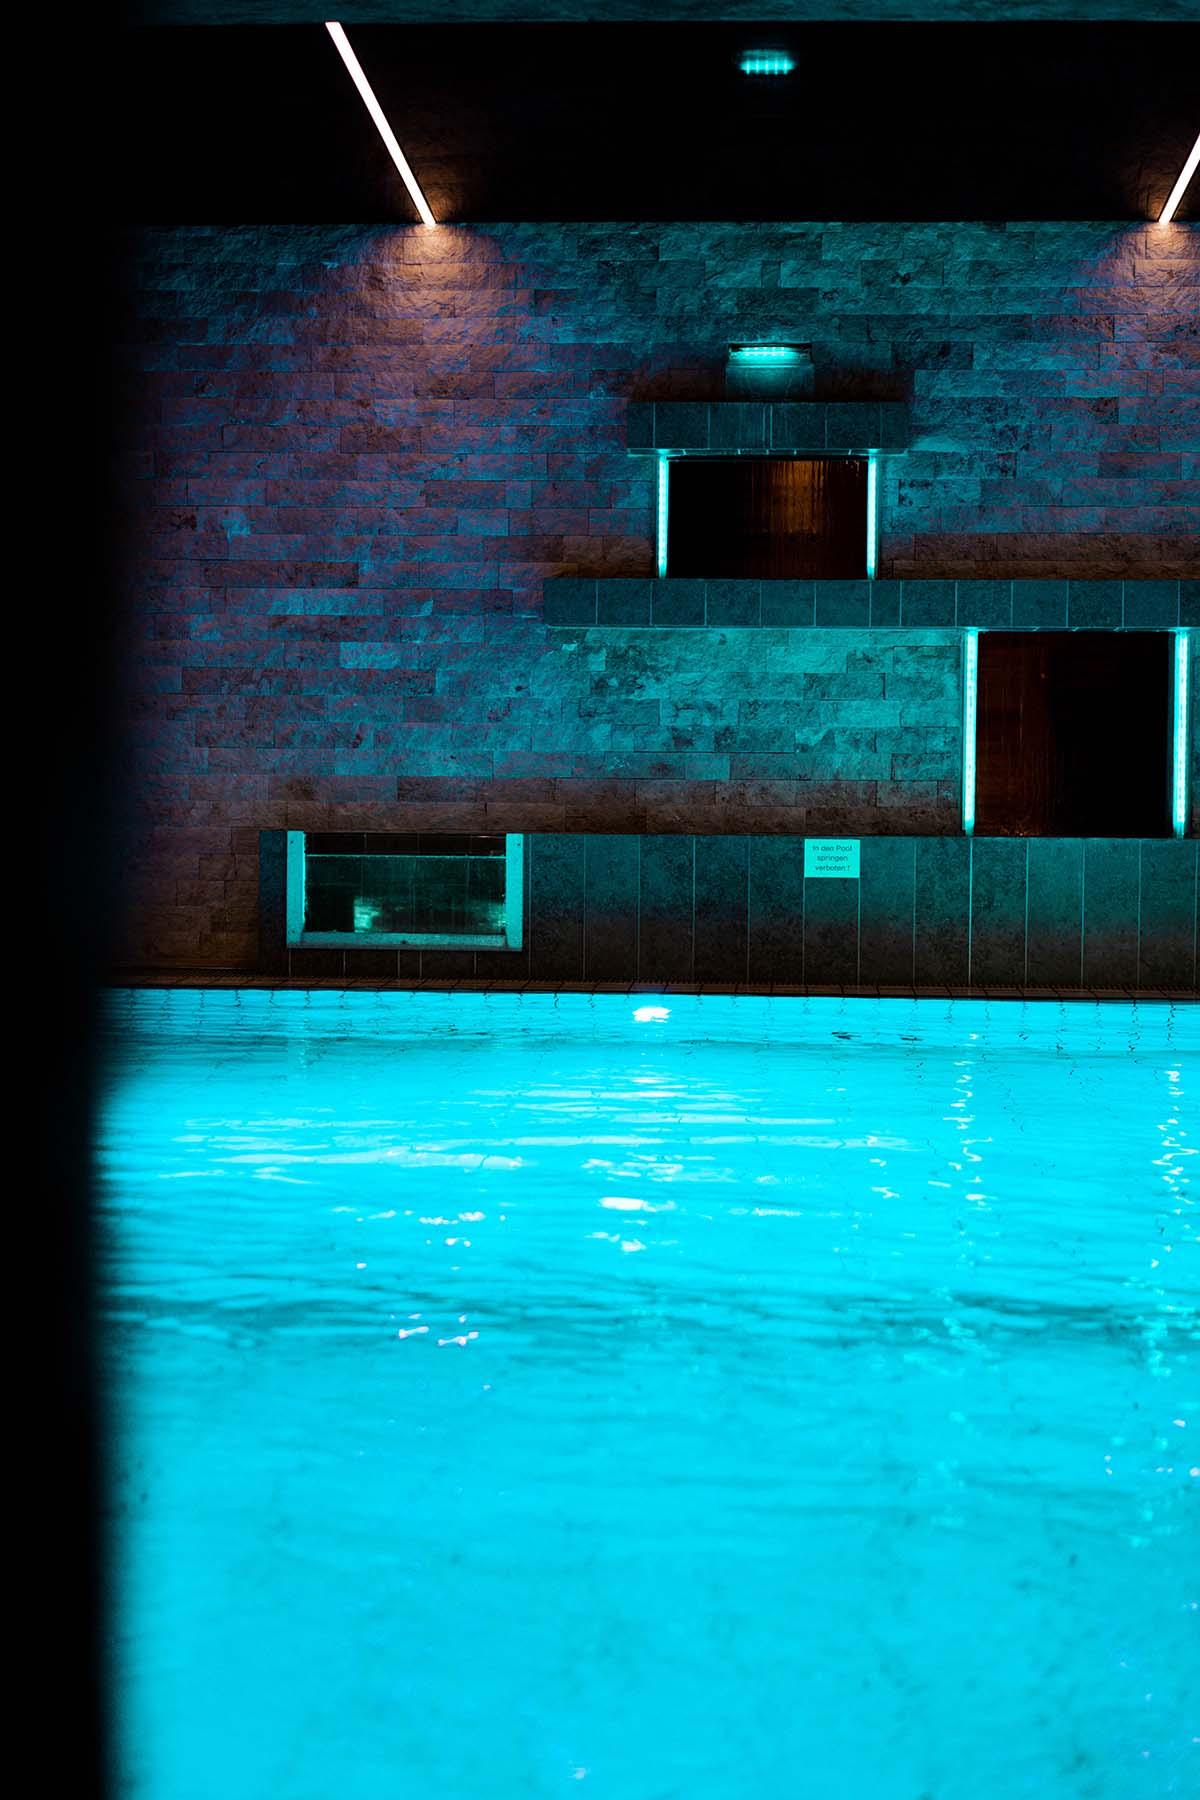 wellnesshotel-bayerwaldhof-pool-detail